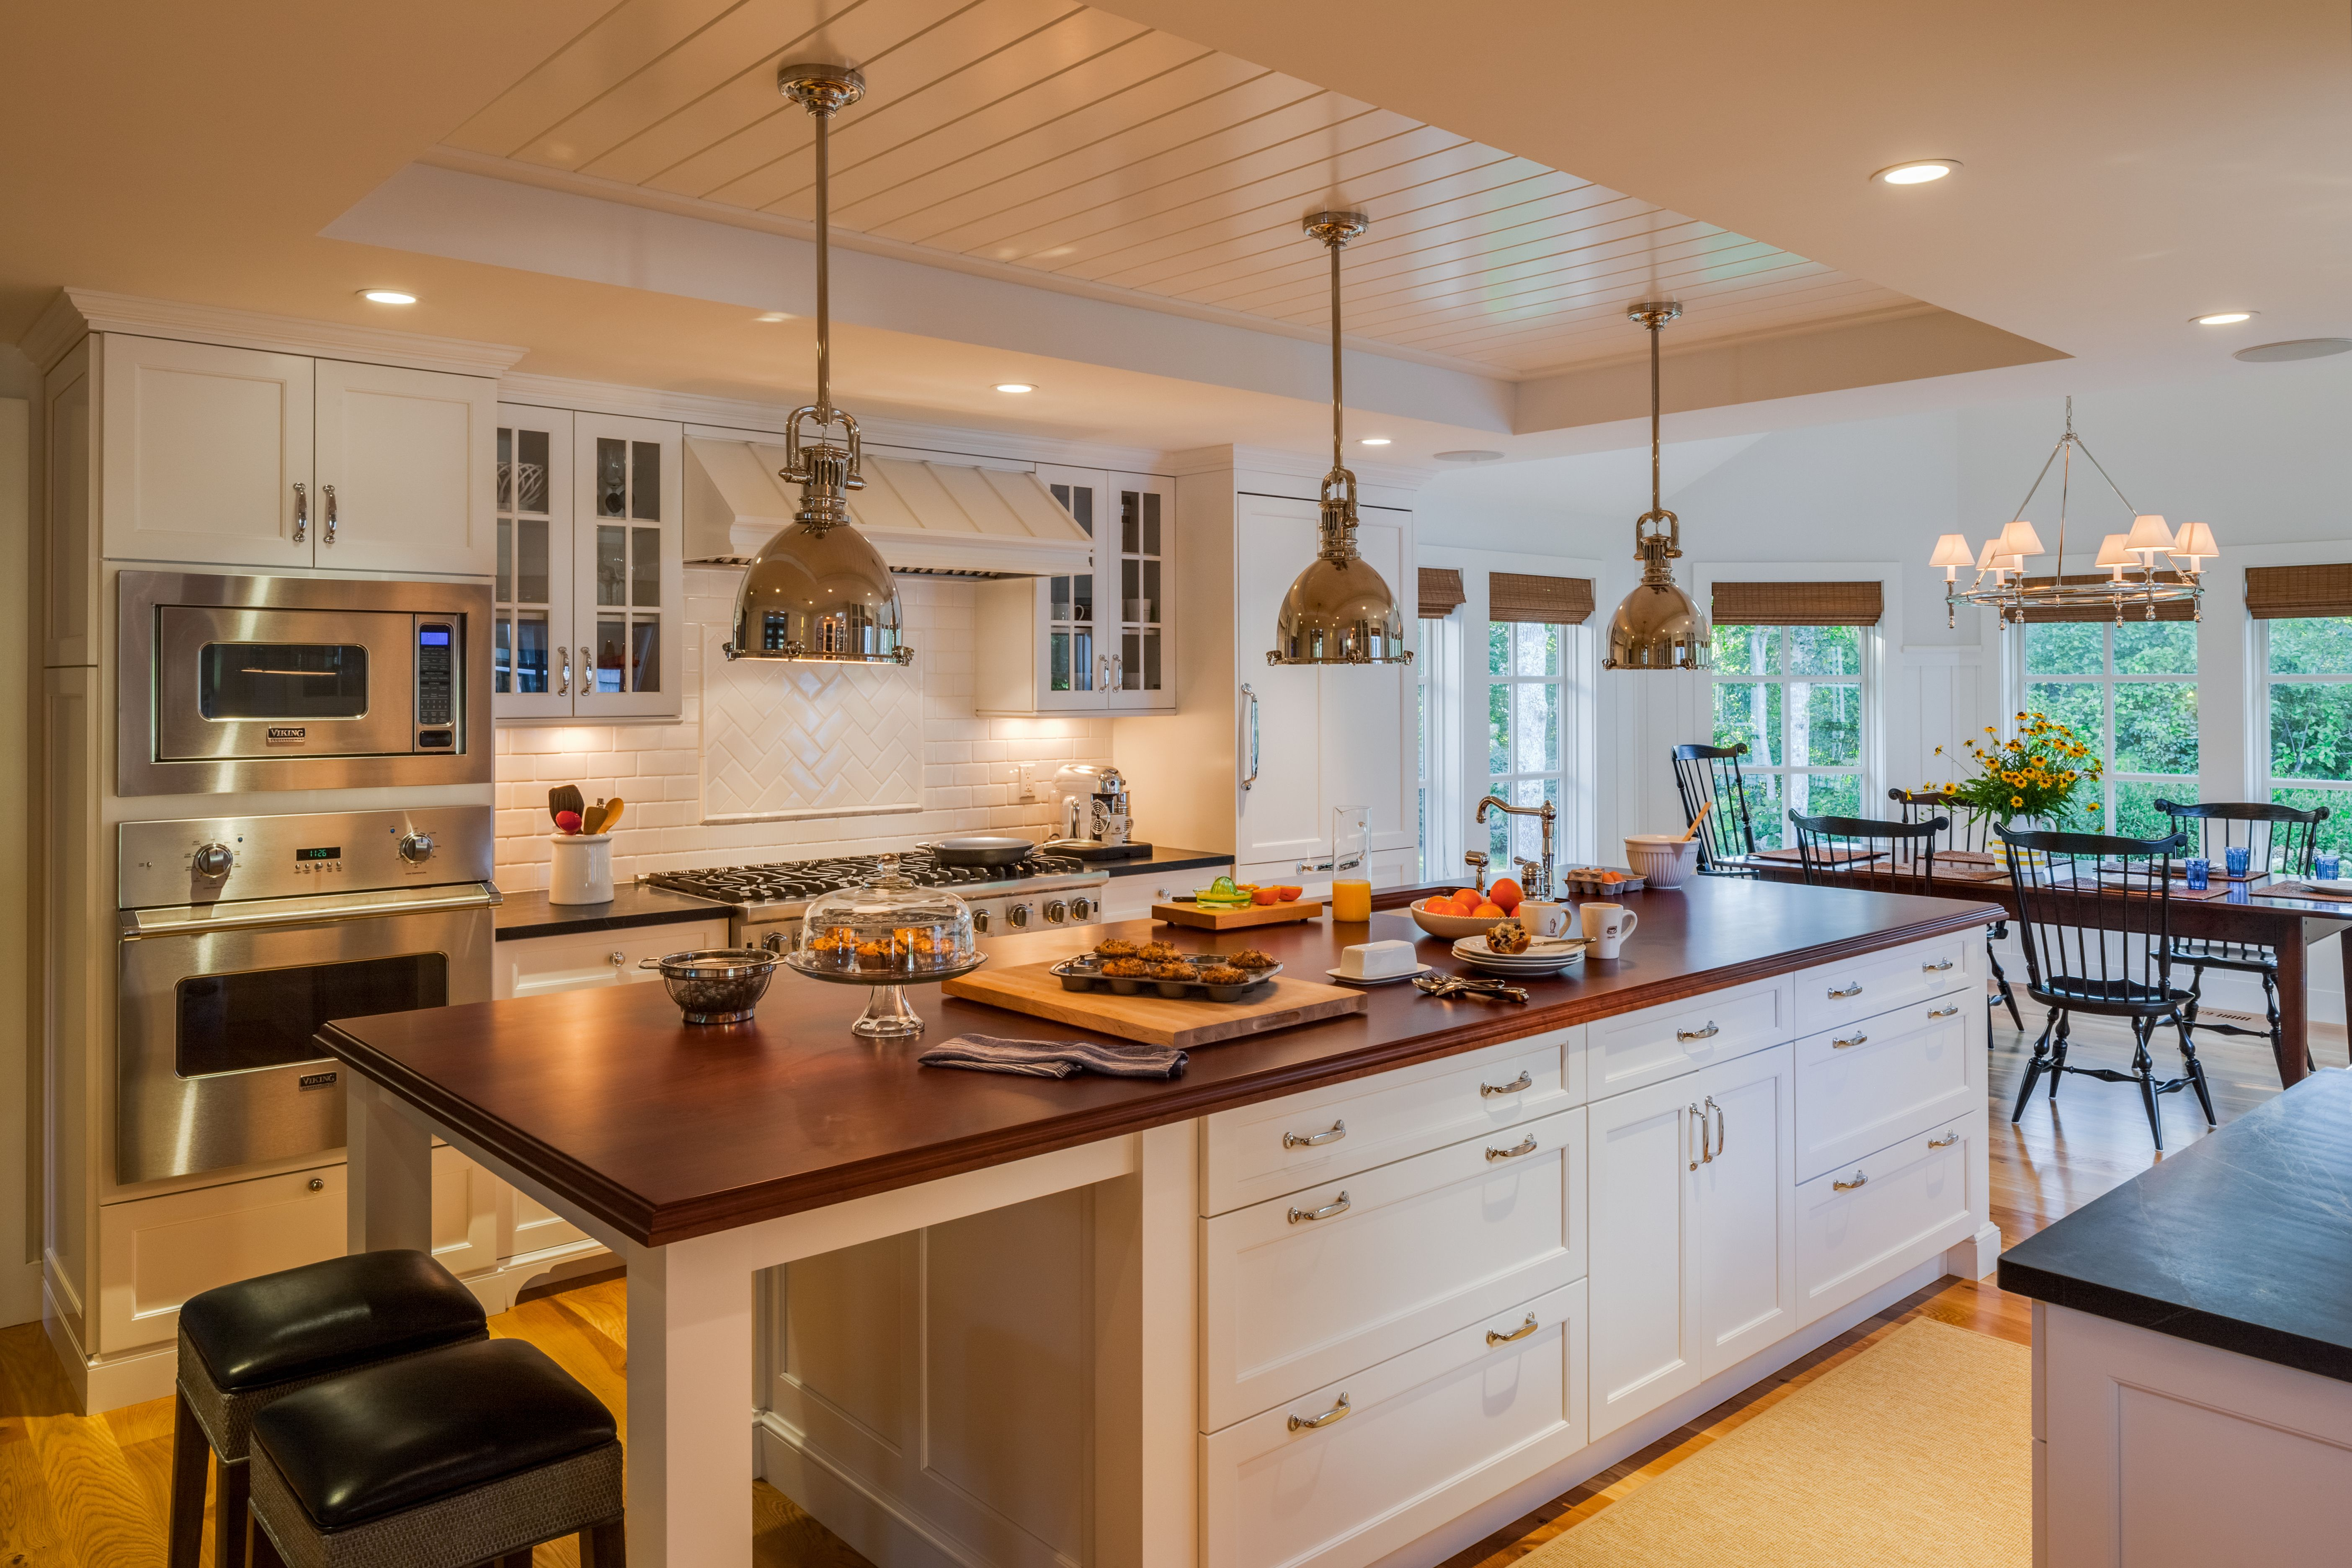 kitchens classic kitchen interiors coastal kitchen design kitchen inspiration design on kitchen interior classic id=14533